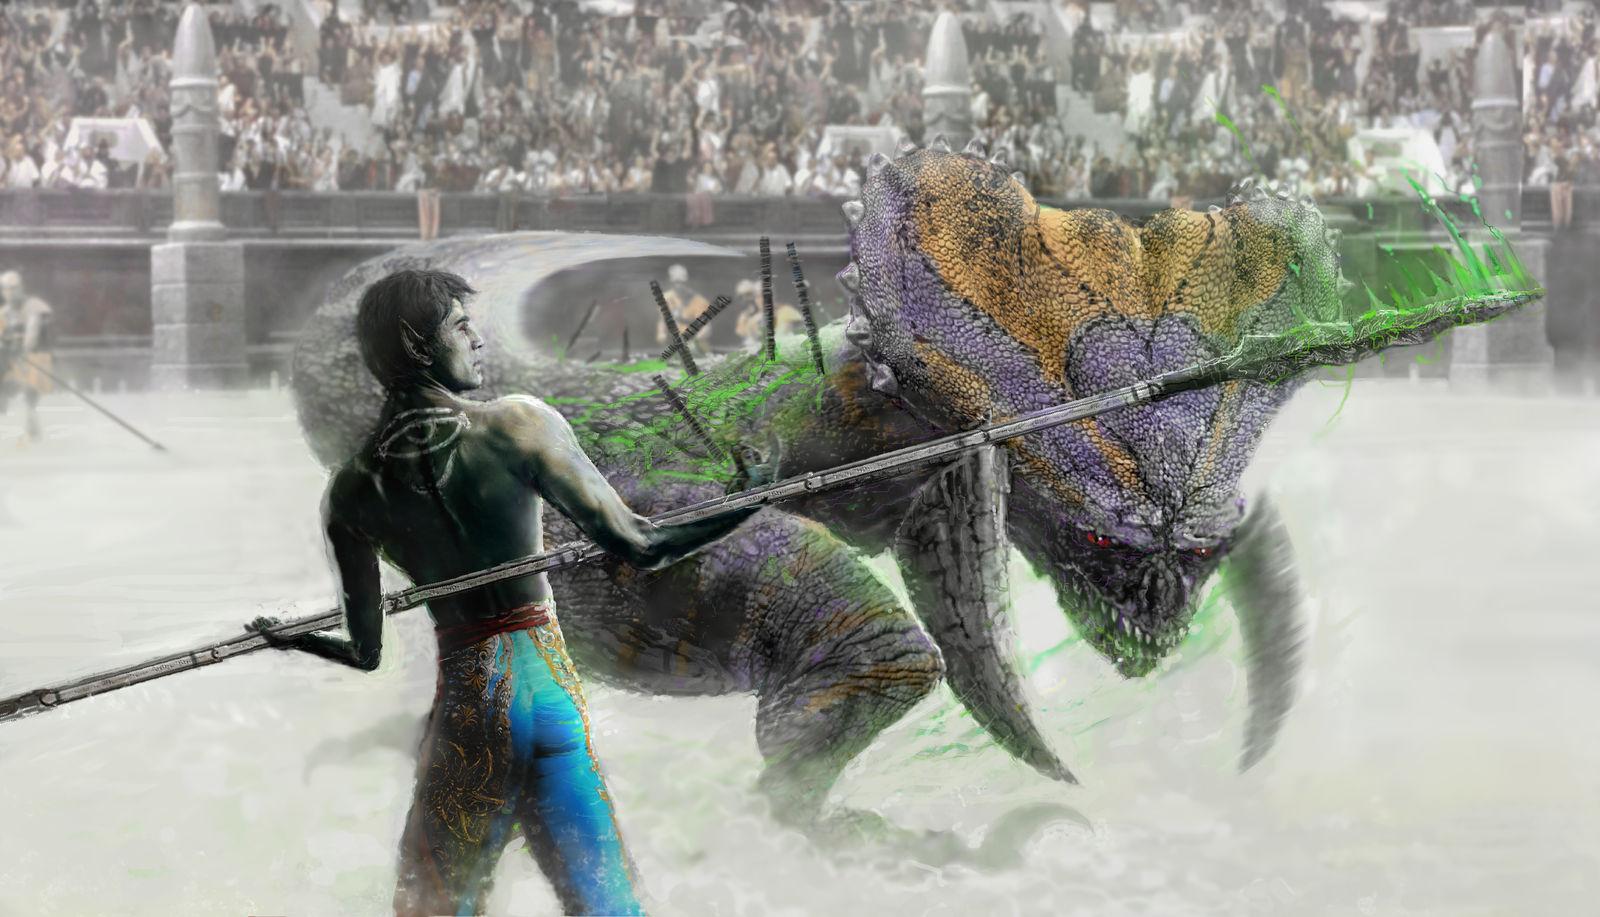 Morrowind Gladiator by modji-33 on DeviantArt